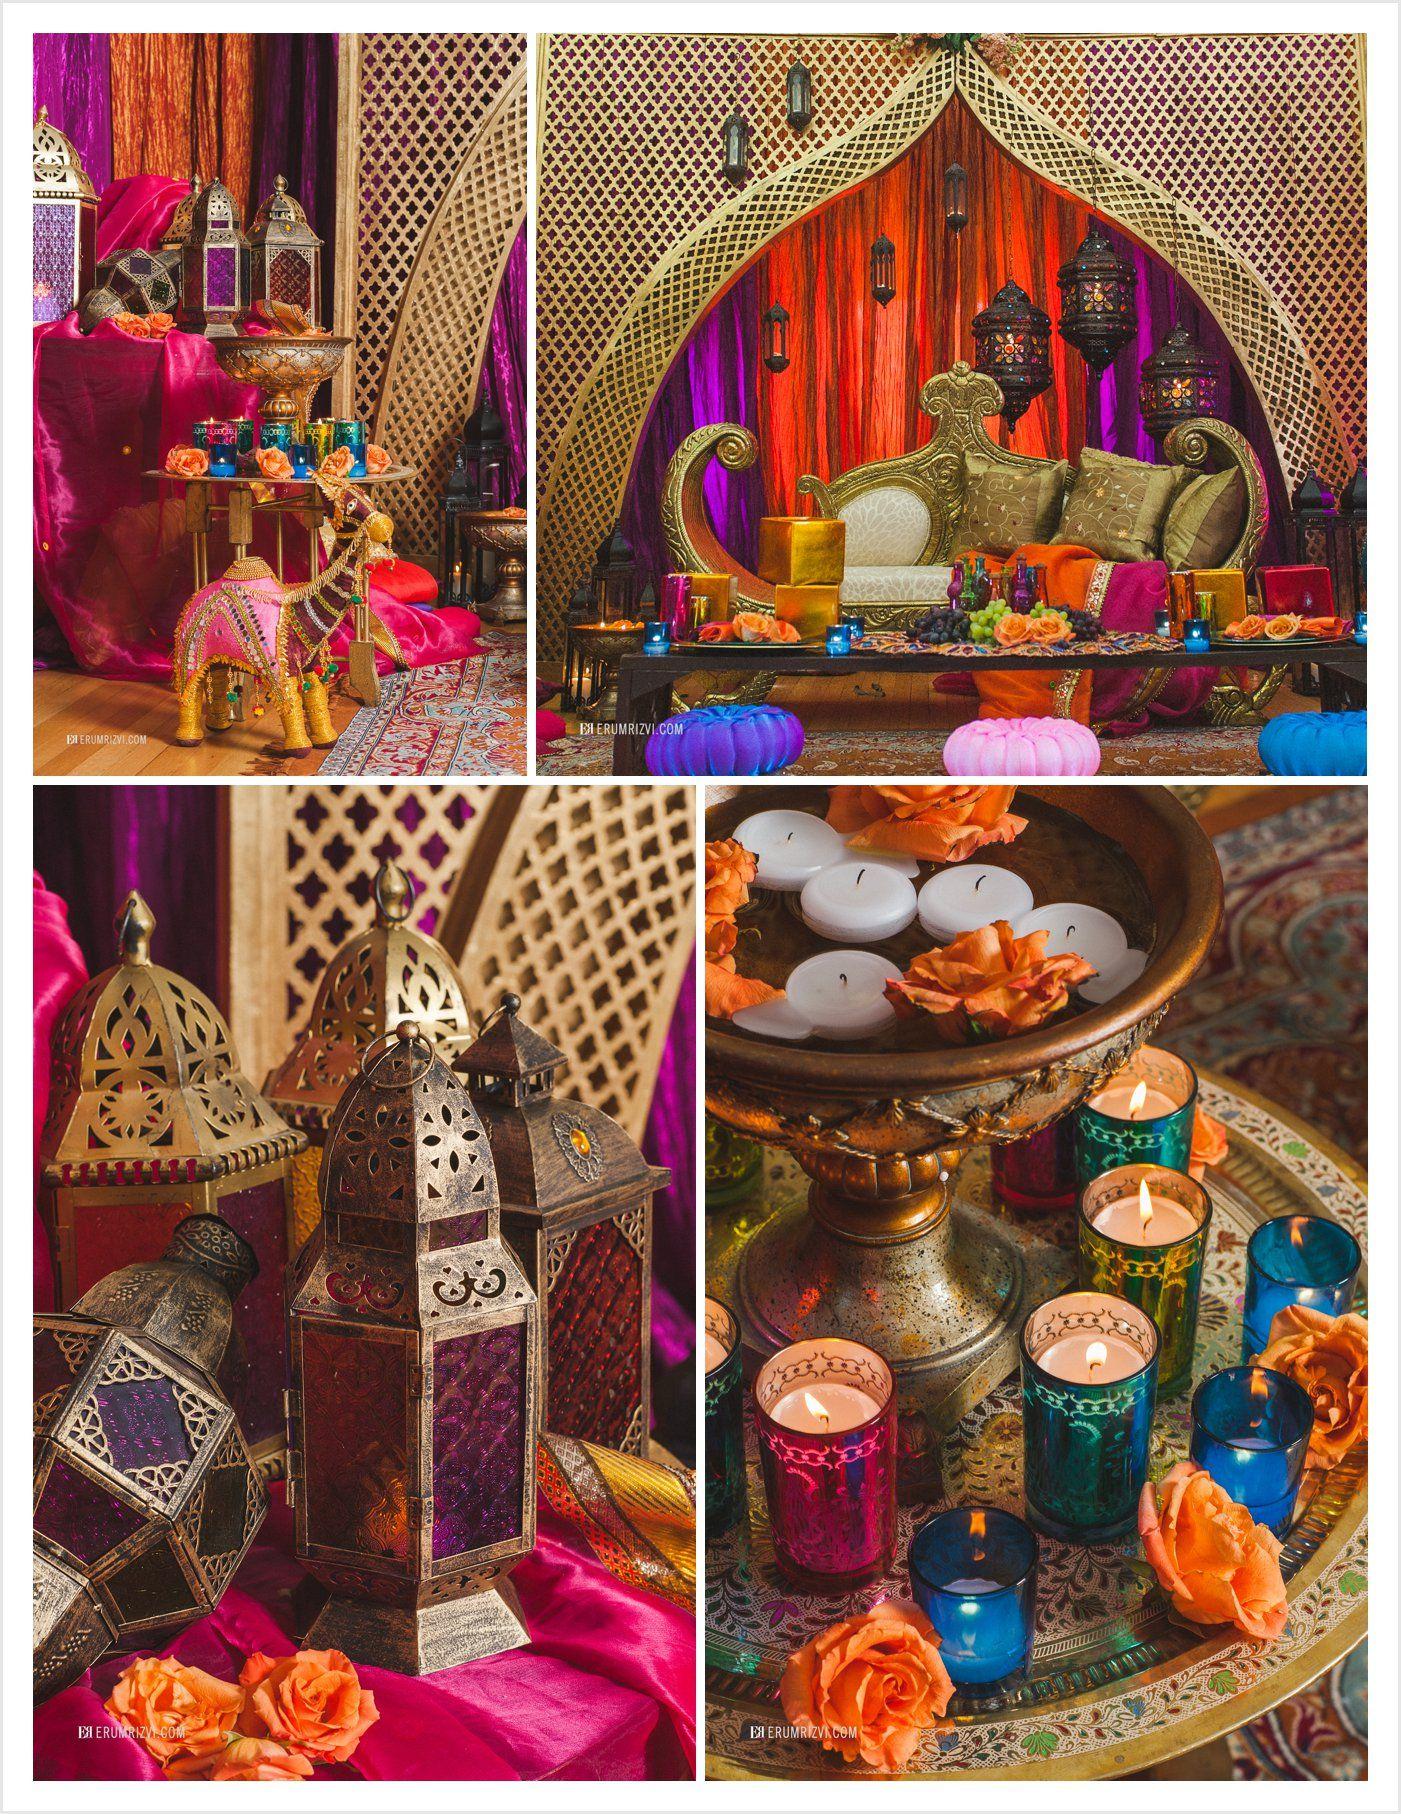 sangeet decoration, indian decor, sangeet decorations at home, floral decoration, sangeet ideas, sangeet ceremony ideas, light decoration for wedding, wedding gate decoration